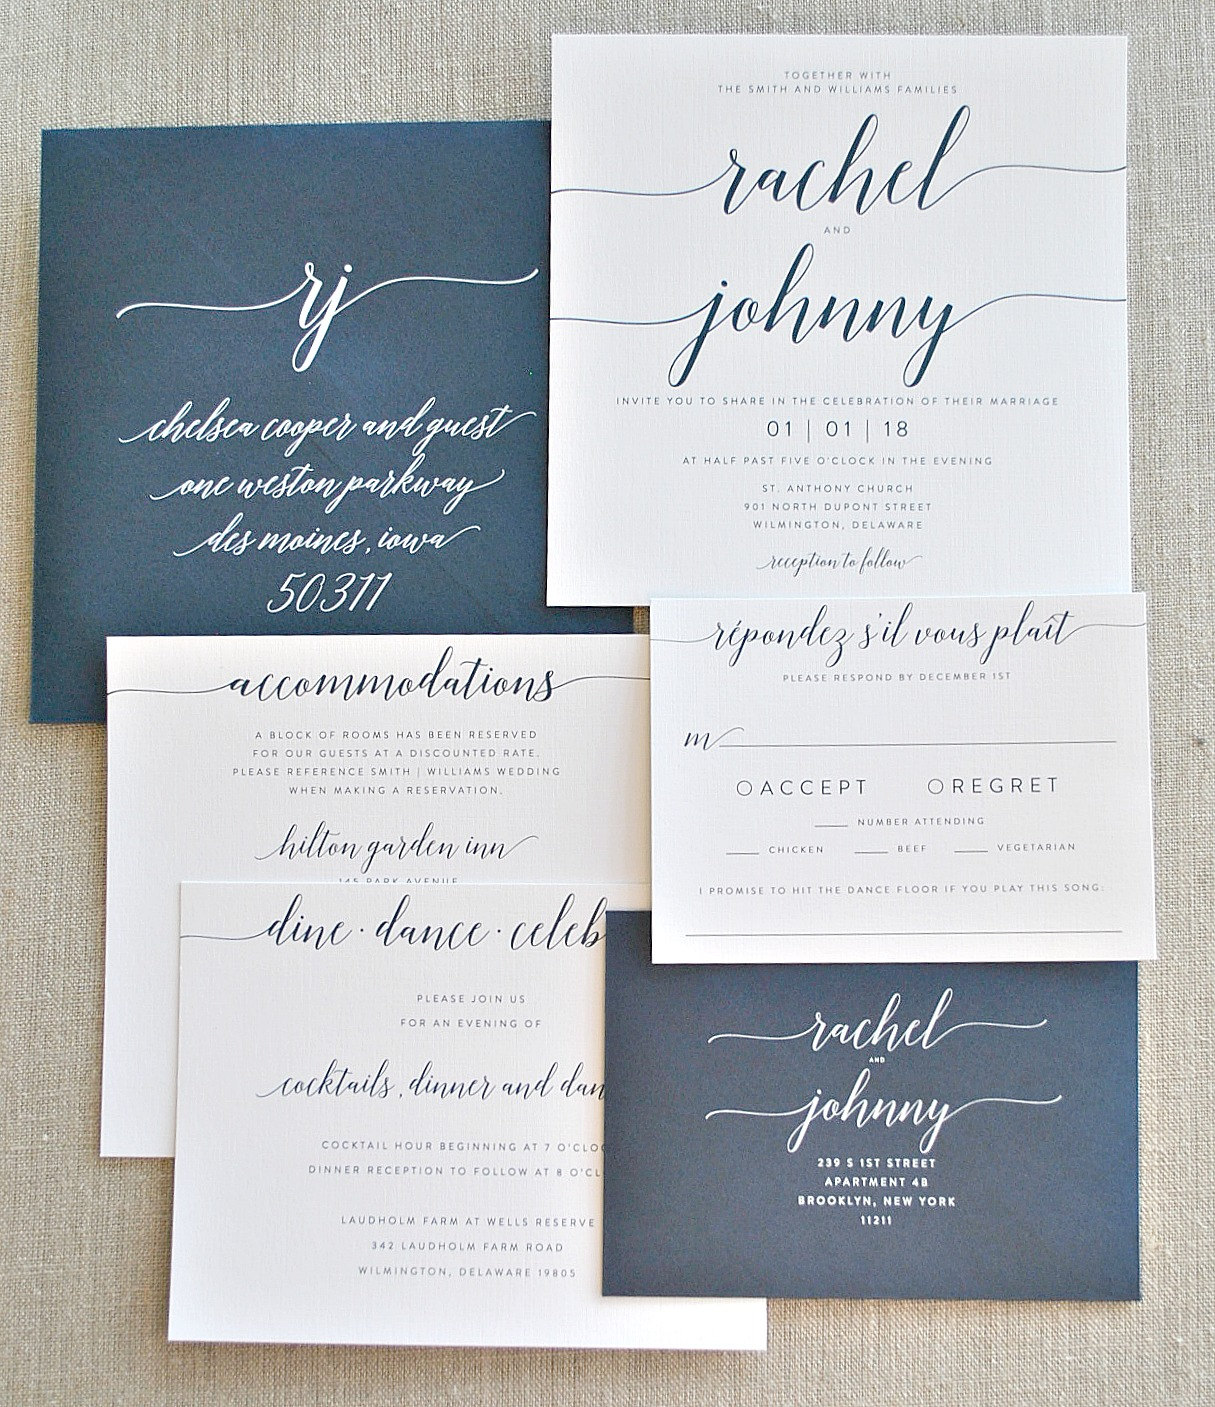 Wedding Reception Invitation Wording 84 Luxury Image from By Invitation